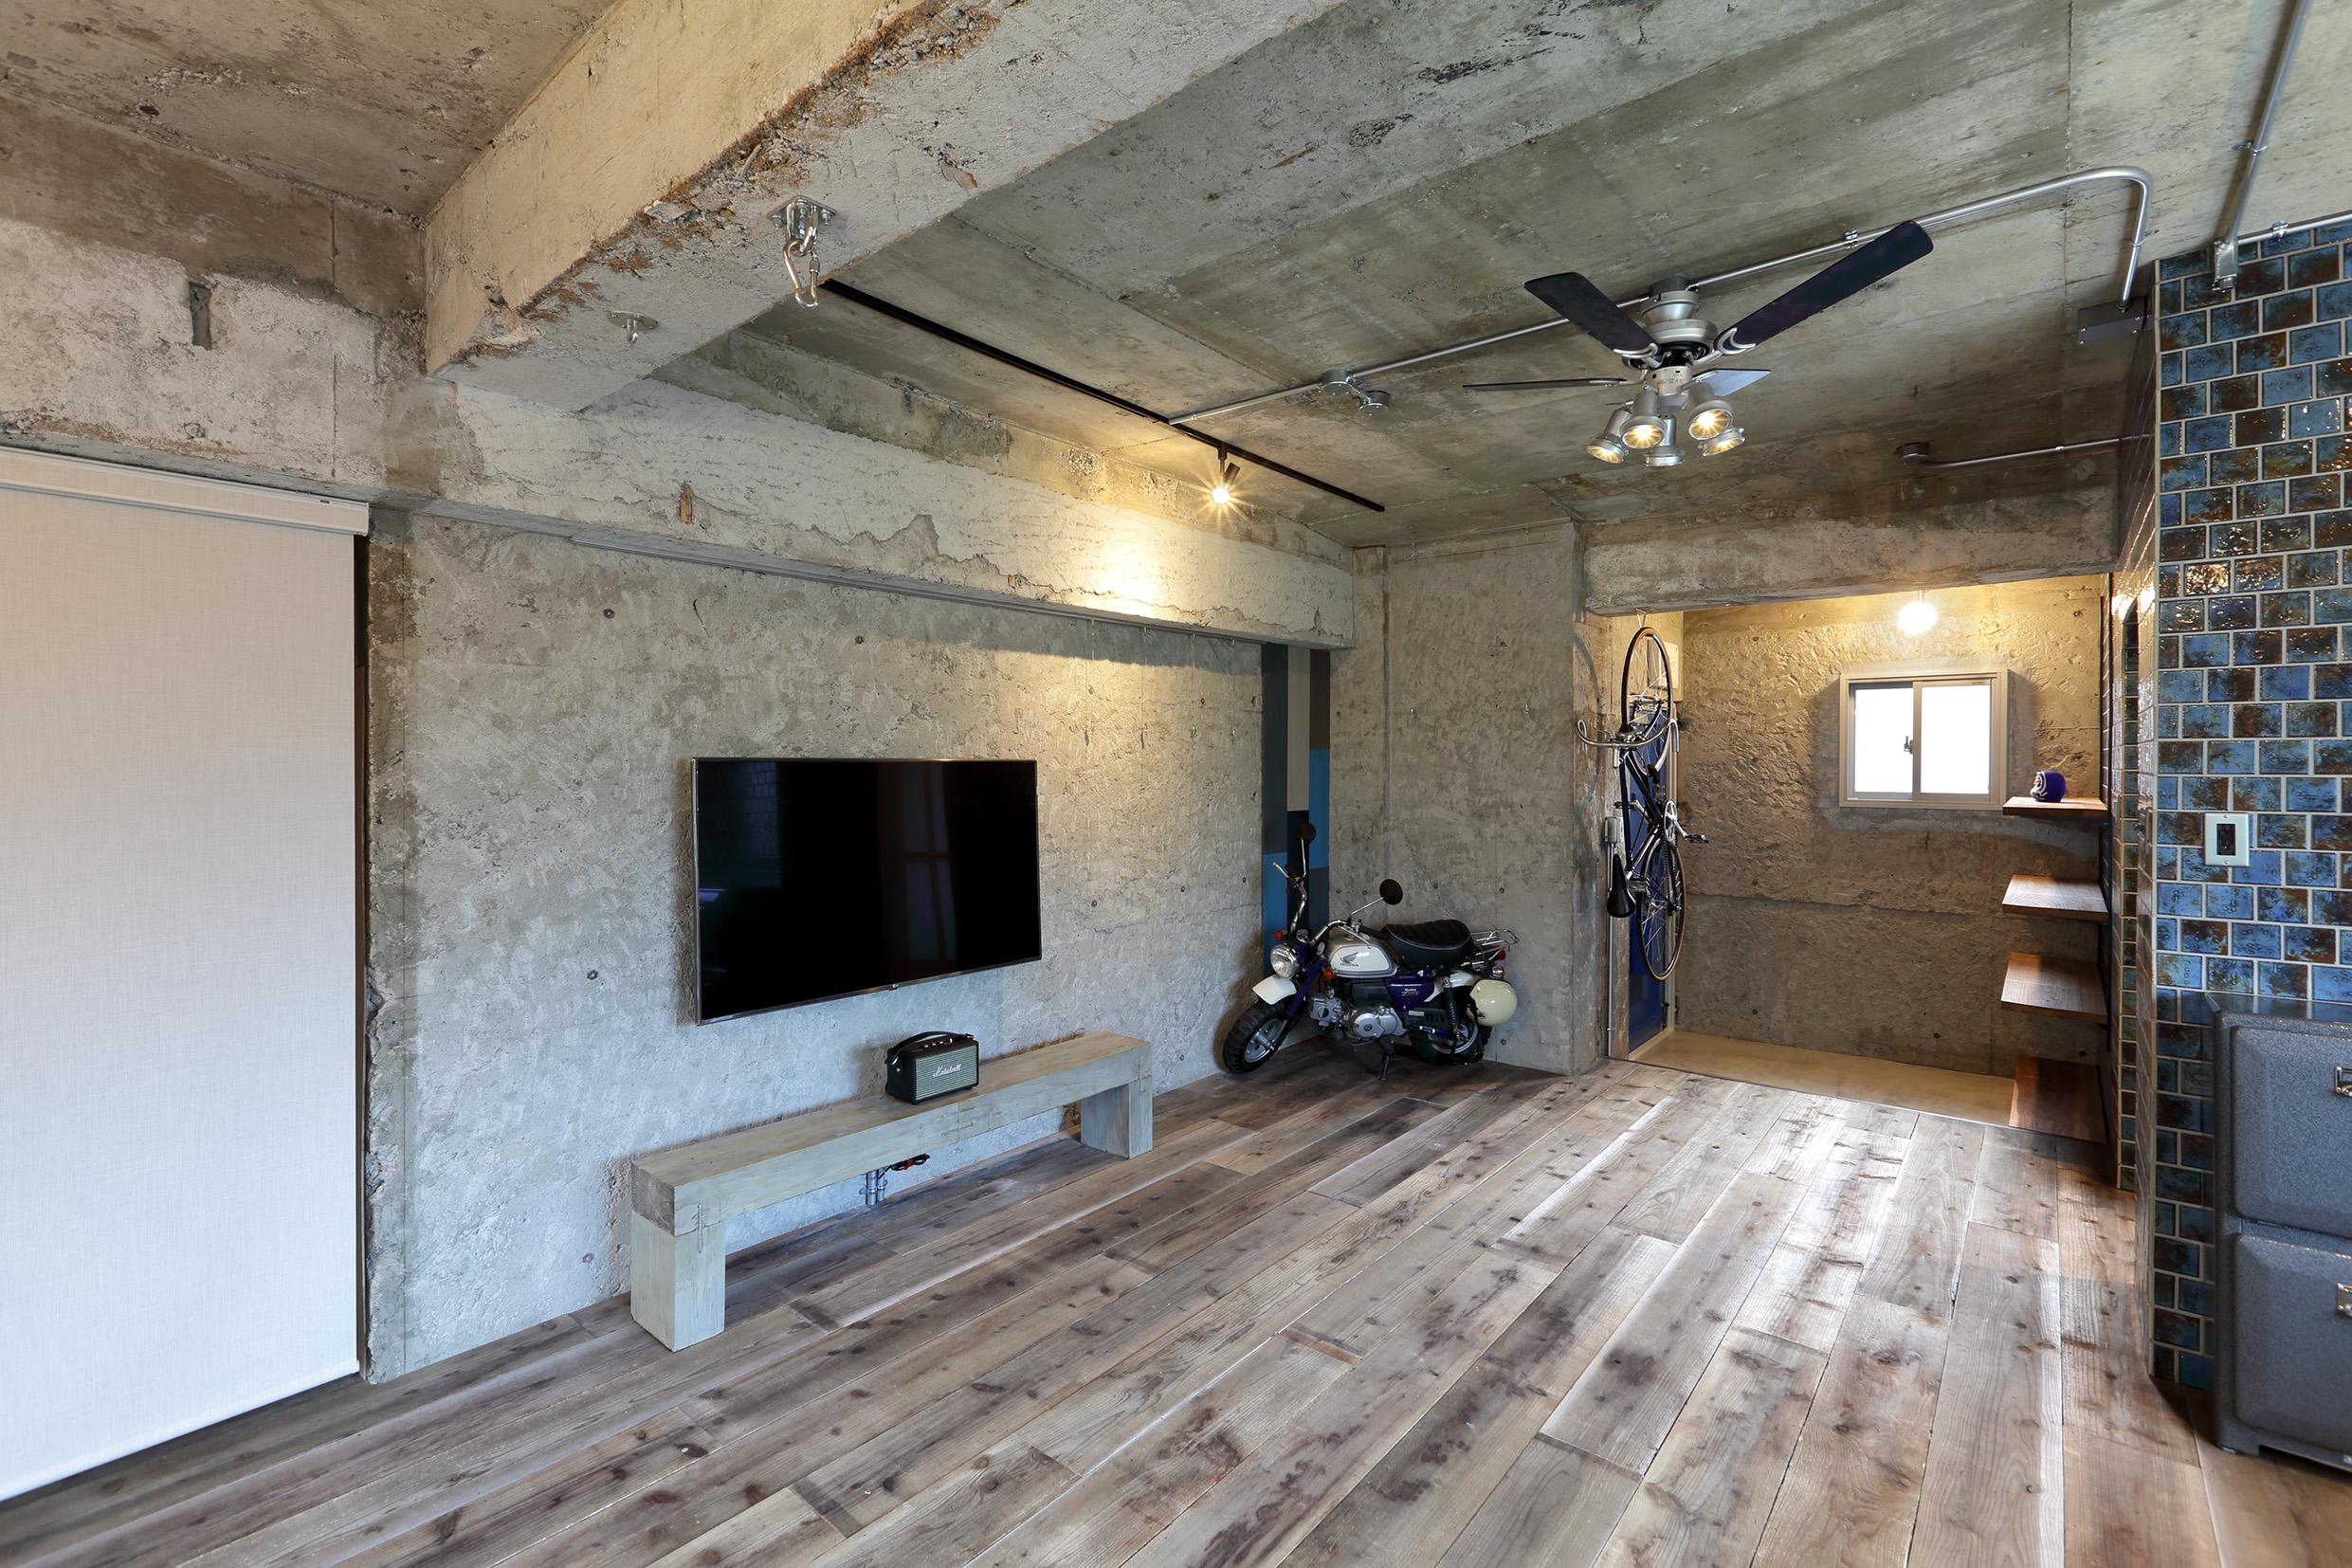 renovation image